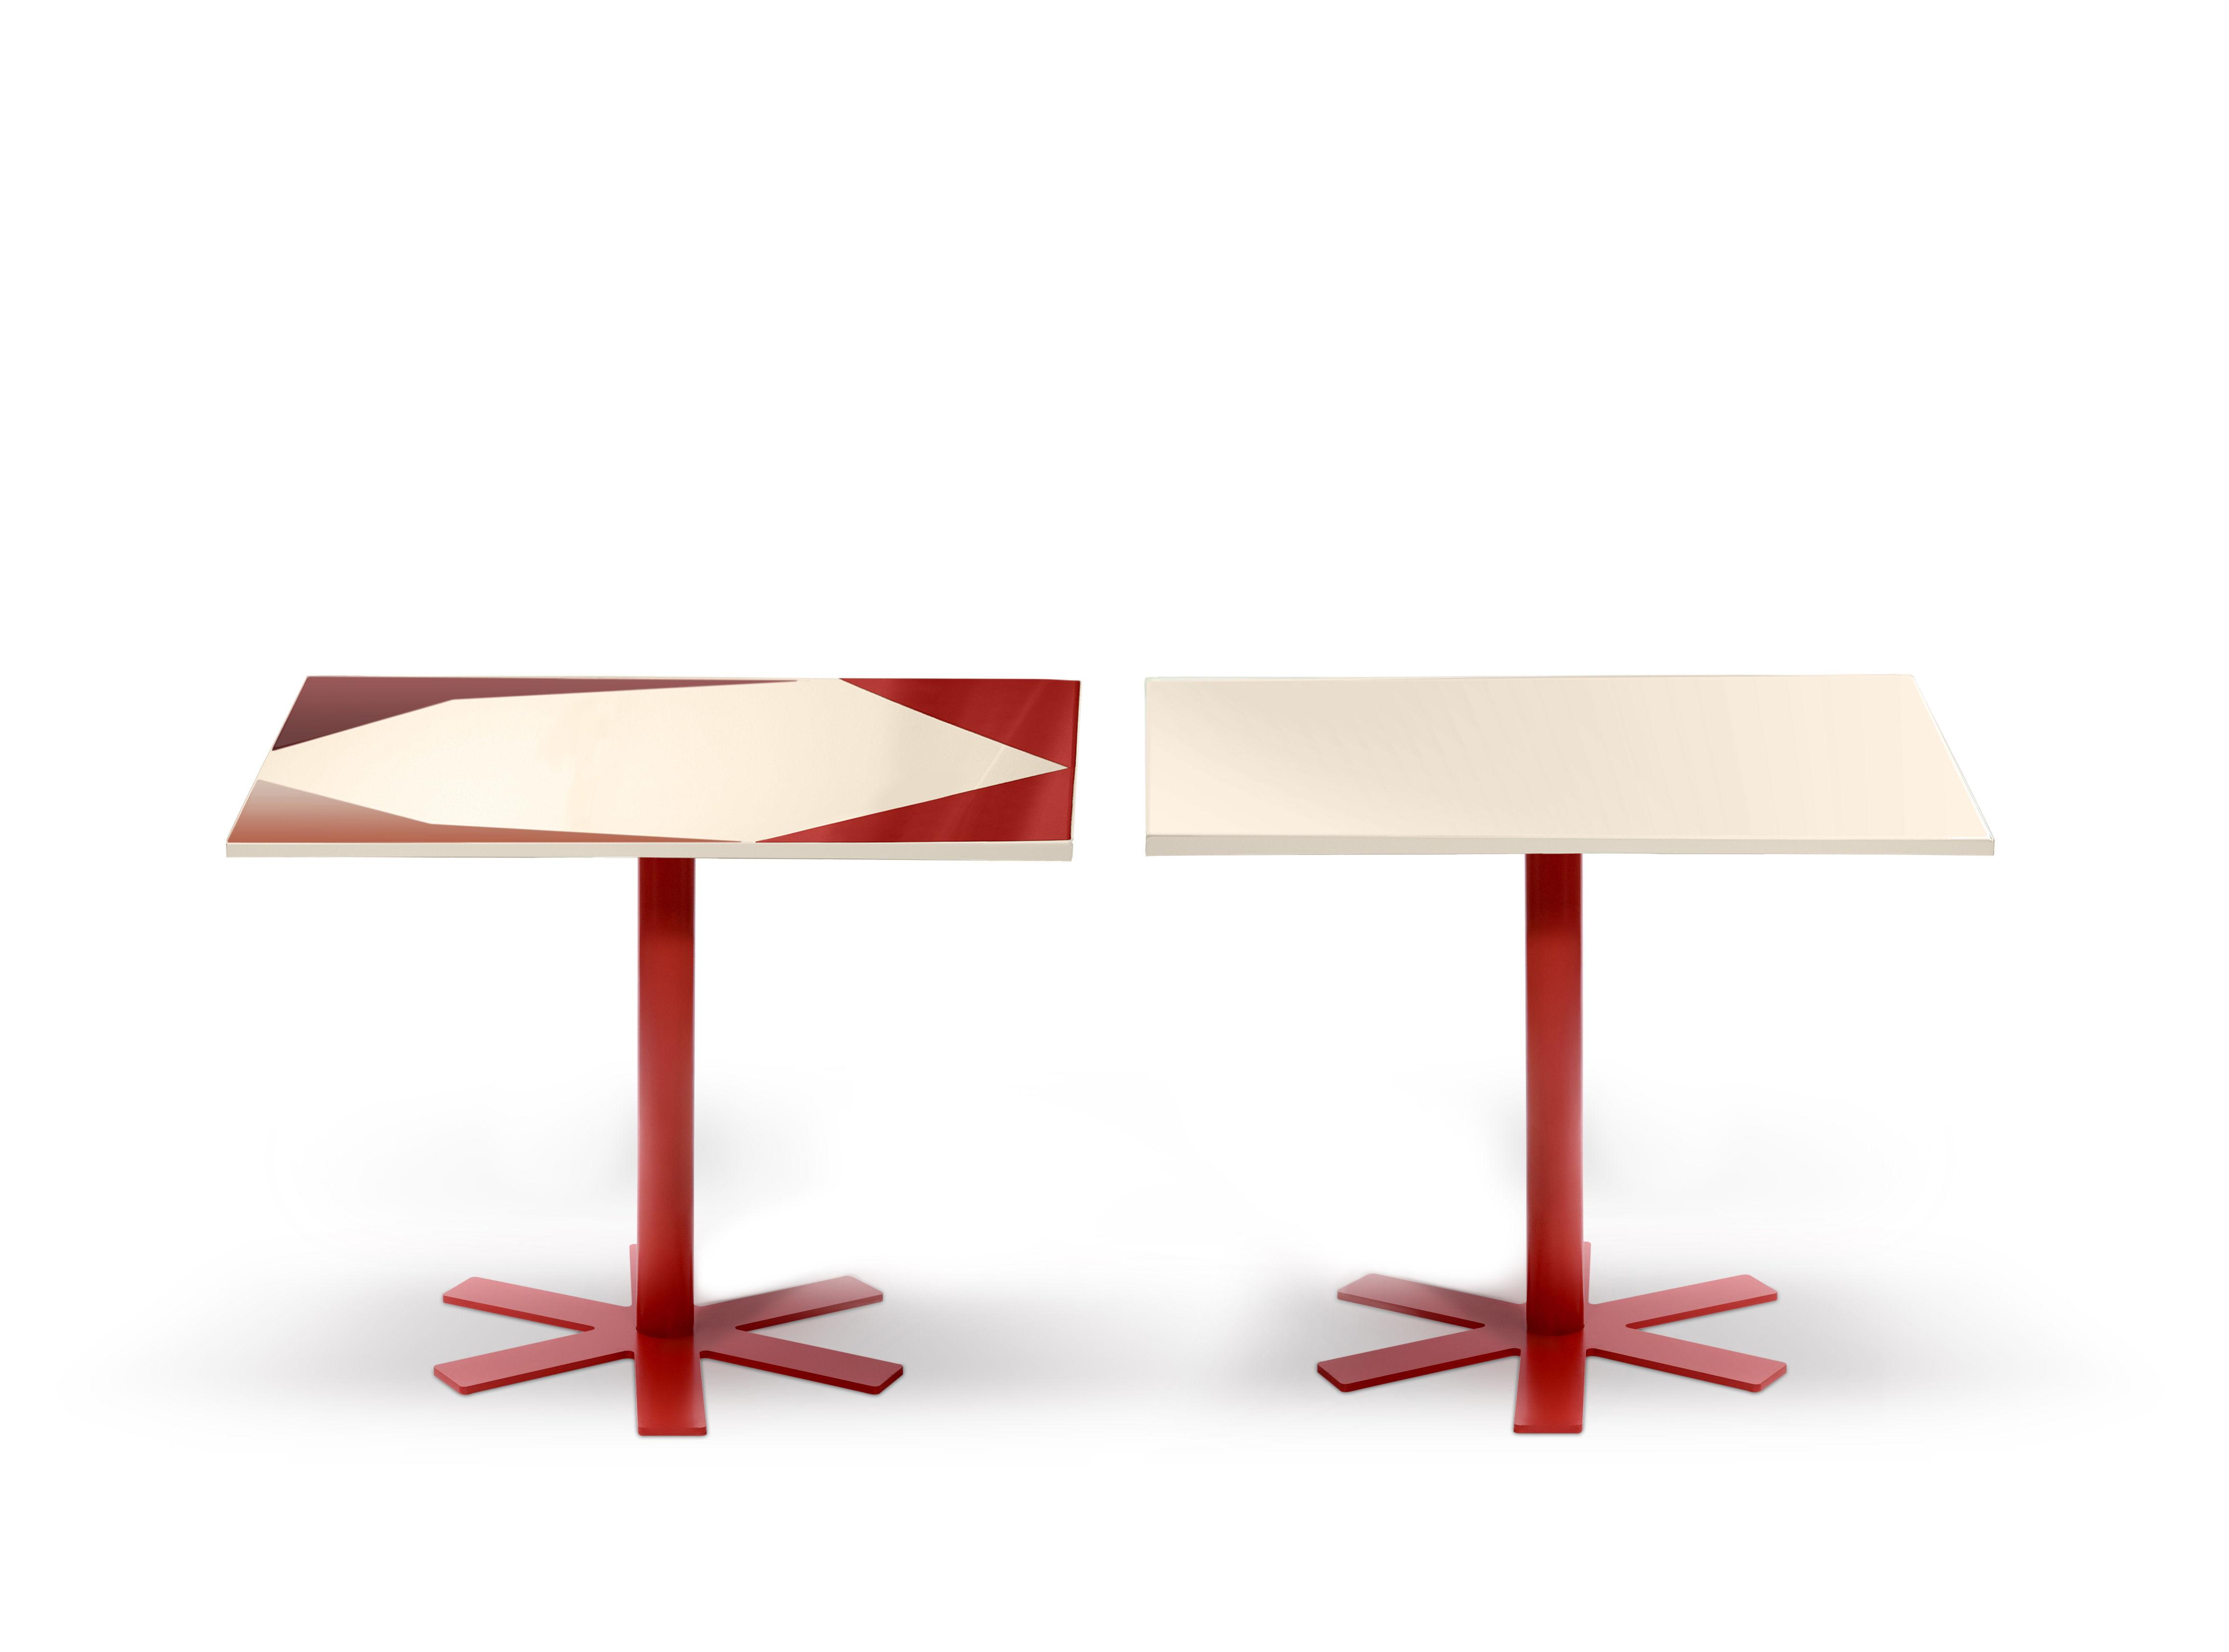 table parrot 90 x 90 cm unie cr me pied rouge petite friture. Black Bedroom Furniture Sets. Home Design Ideas